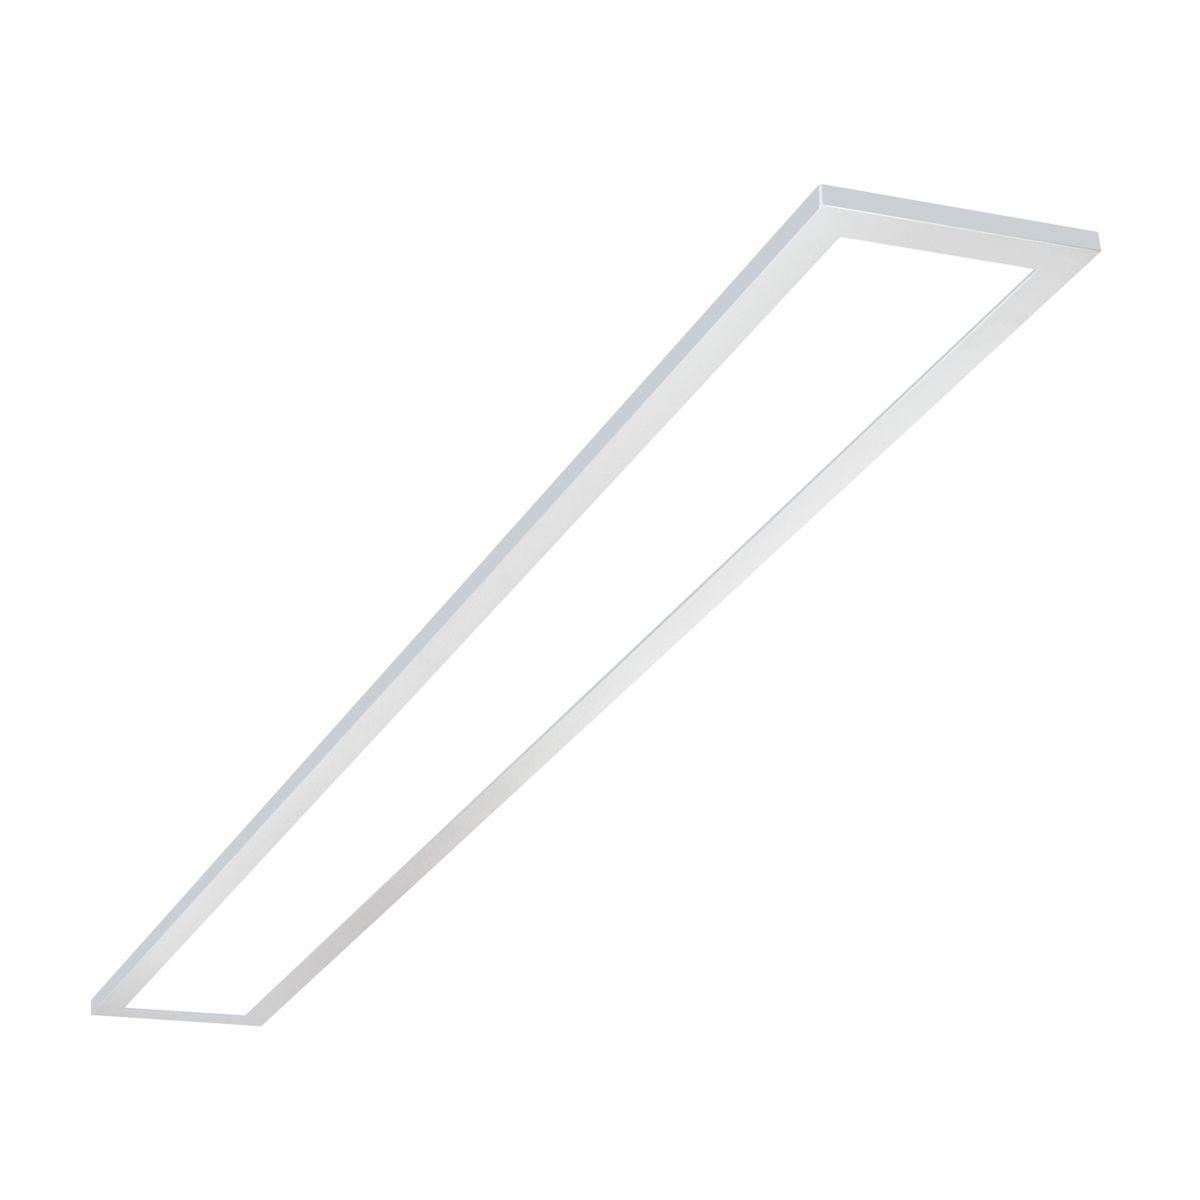 RBG LED Series